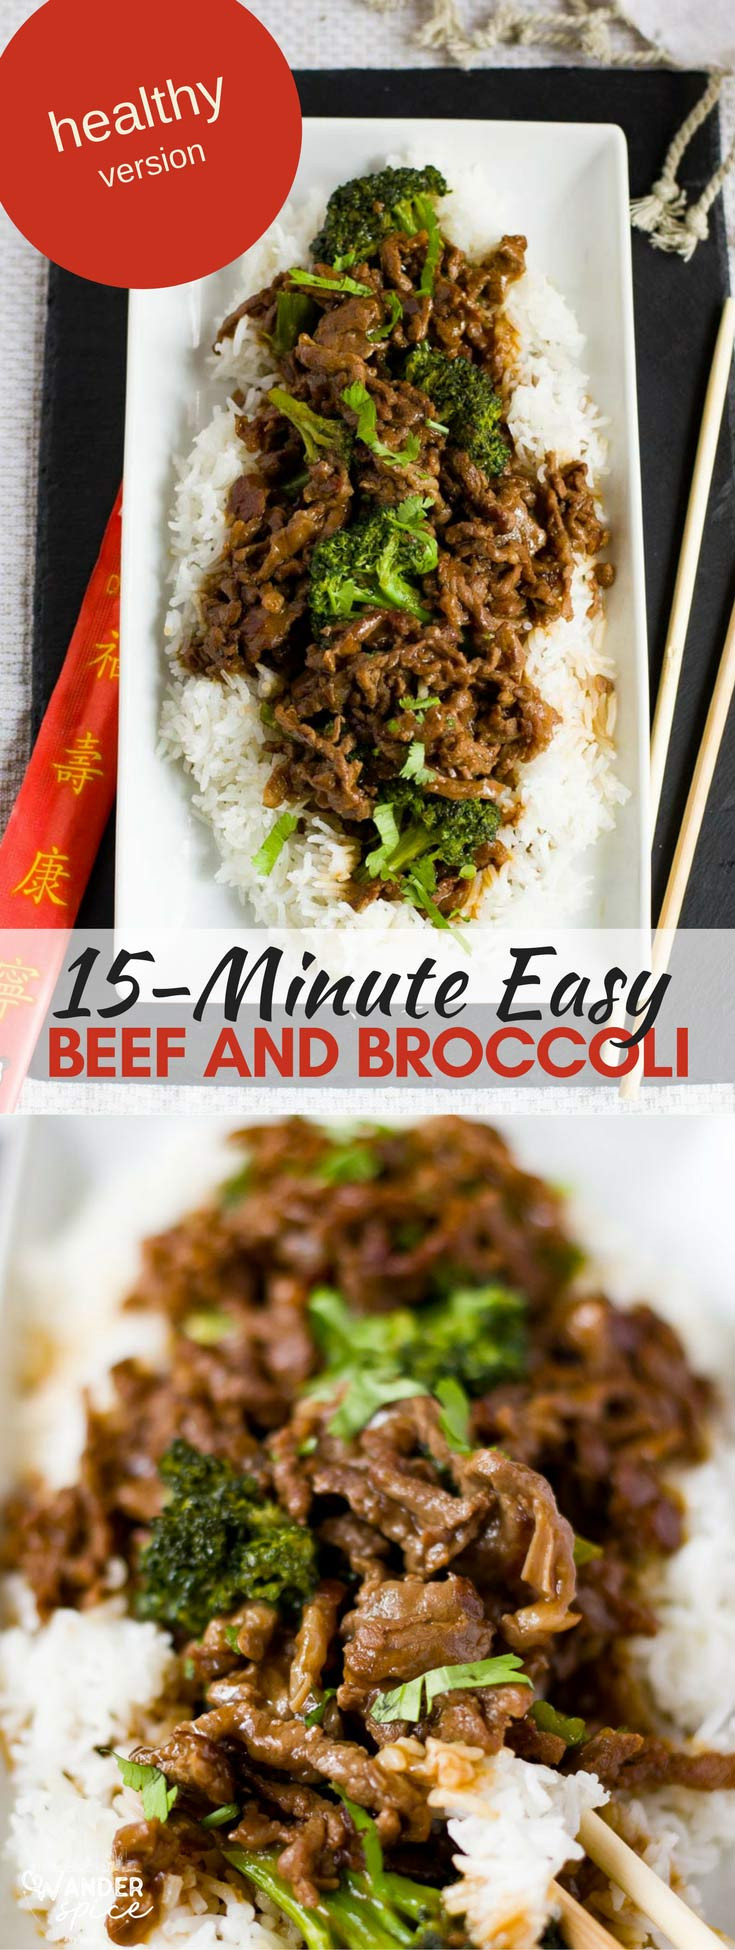 Healthy Ground Beef And Broccoli Recipe  Healthy Beef and Broccoli [Organic] – Wanderspice